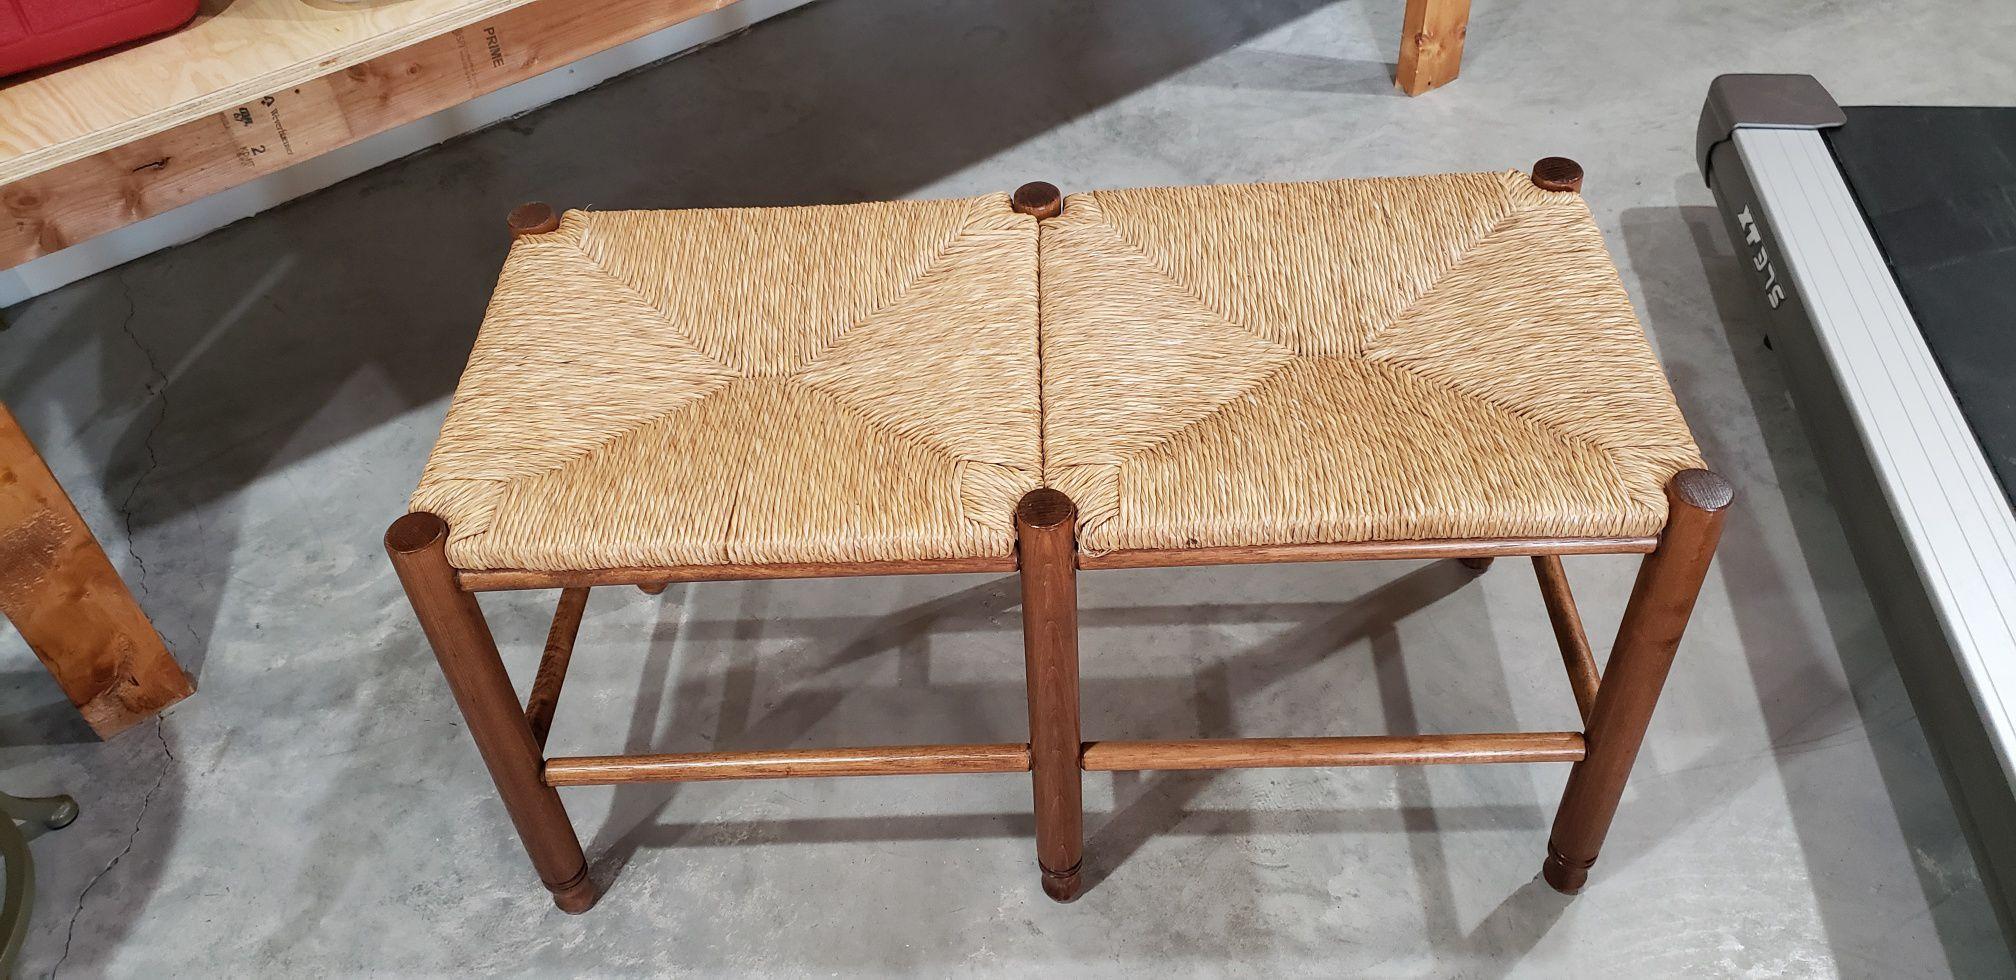 Wood Bench image 1